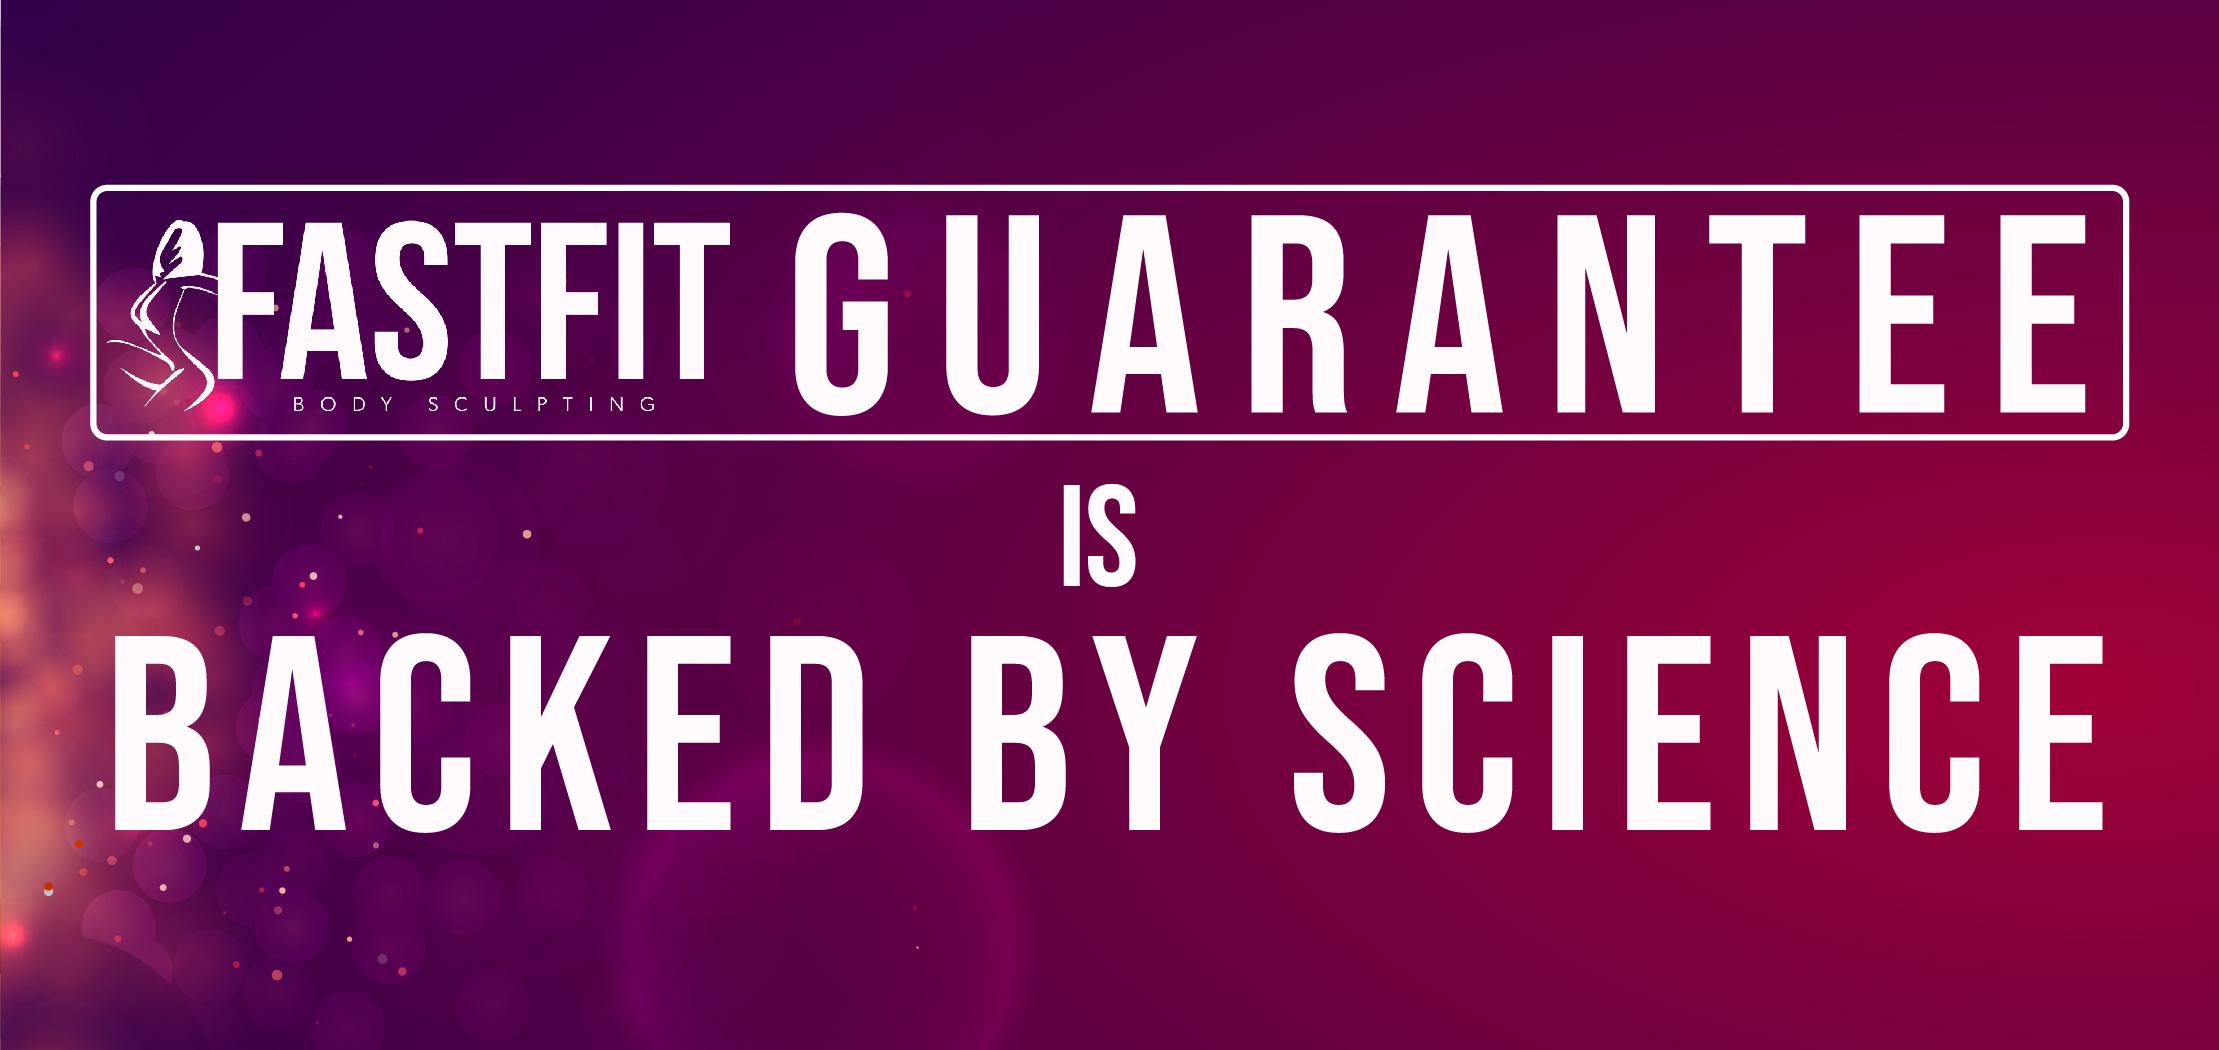 fast fit body sculpting science bg